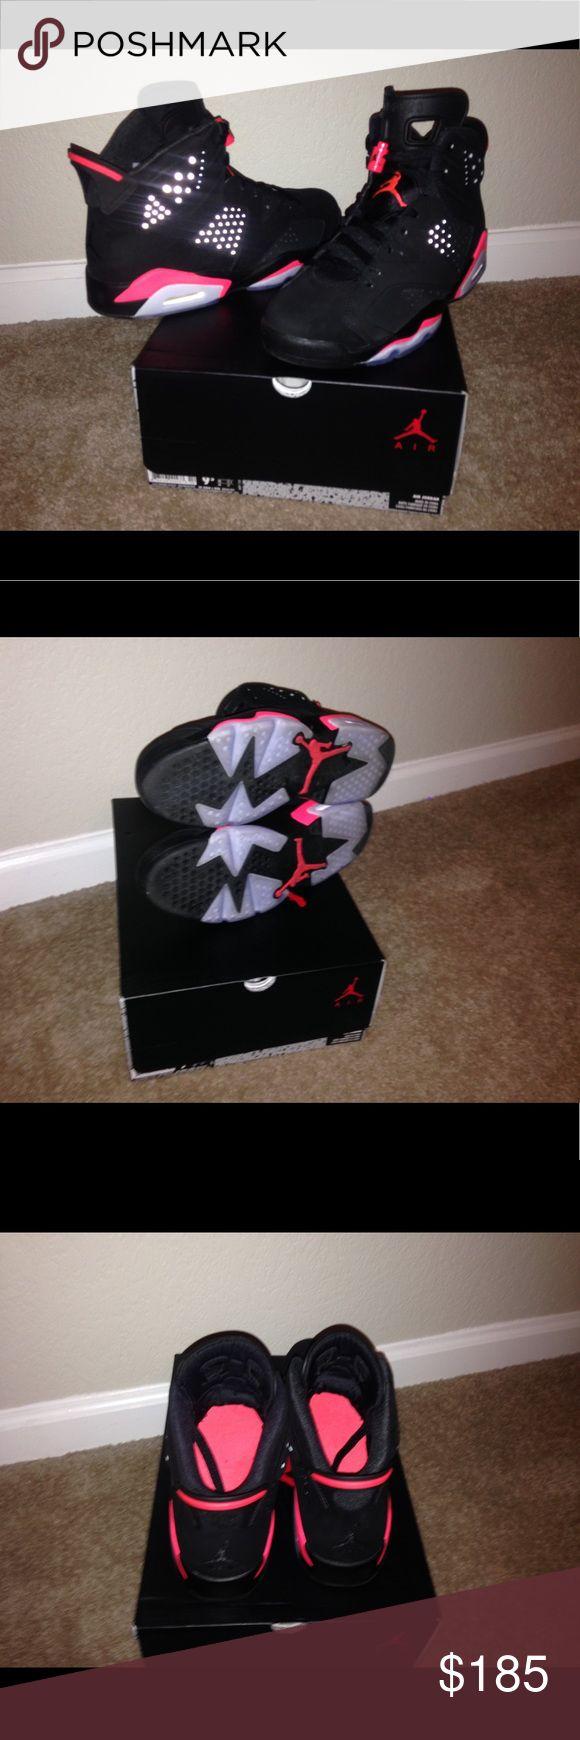 Air Jordan 6 Retro (Infrared) 2014 Sz 9.5 NDS W/Box Air Jordan Shoes Sneakers